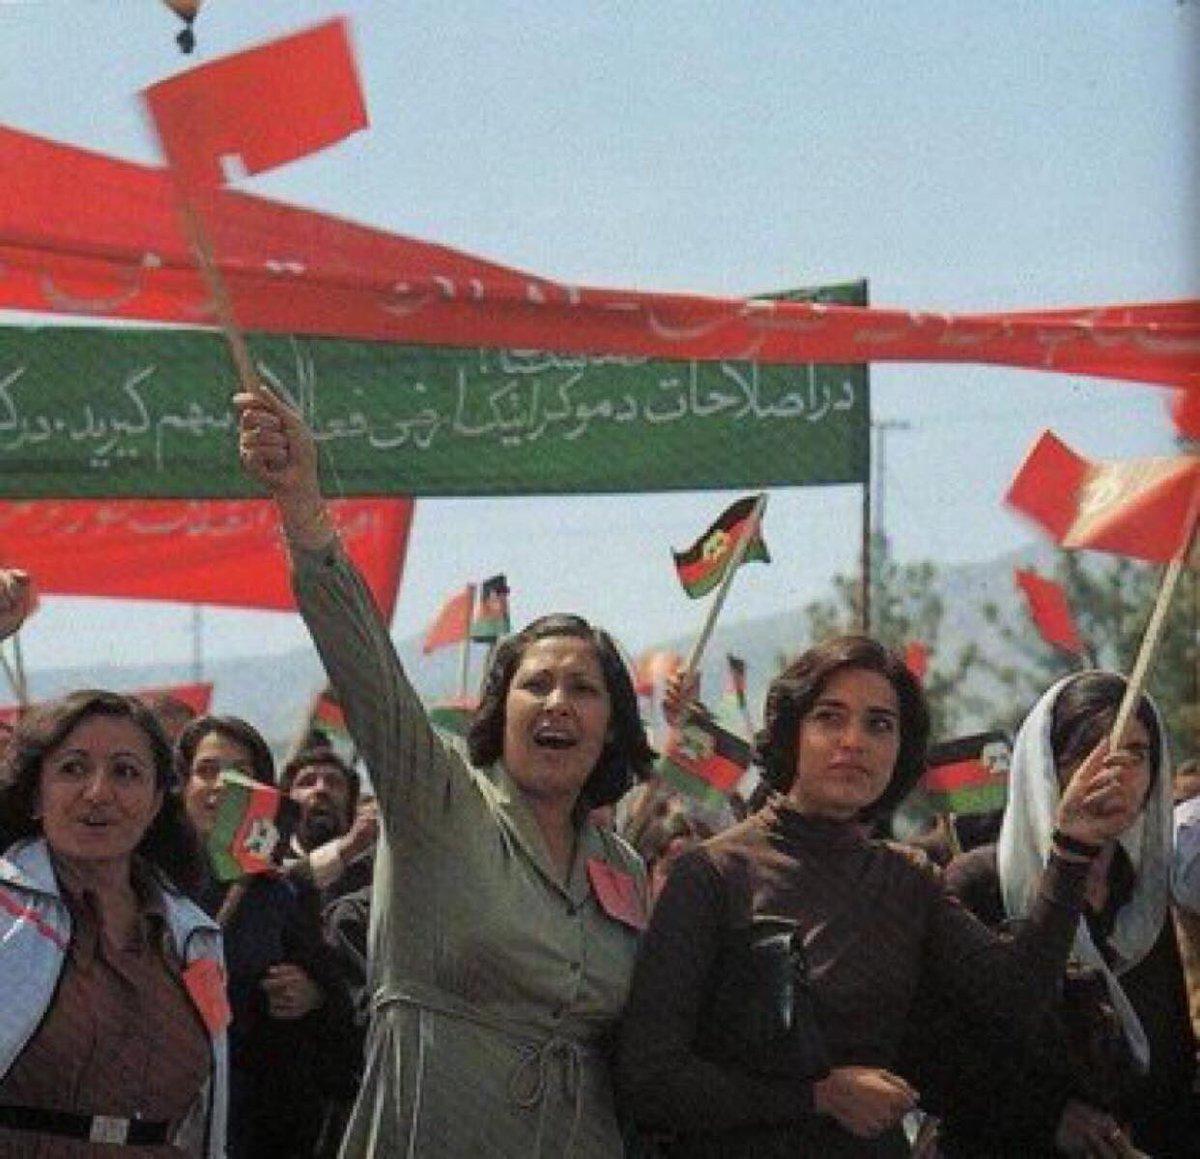 Afghanistan: Yesterday - Today - Tomorrow Speech By Prof. Vijay Prasad. Article Tamil Translation By Vee. Paa. Ganesan. ஆப்கானிஸ்தான்: நேற்று – இன்று - நாளை